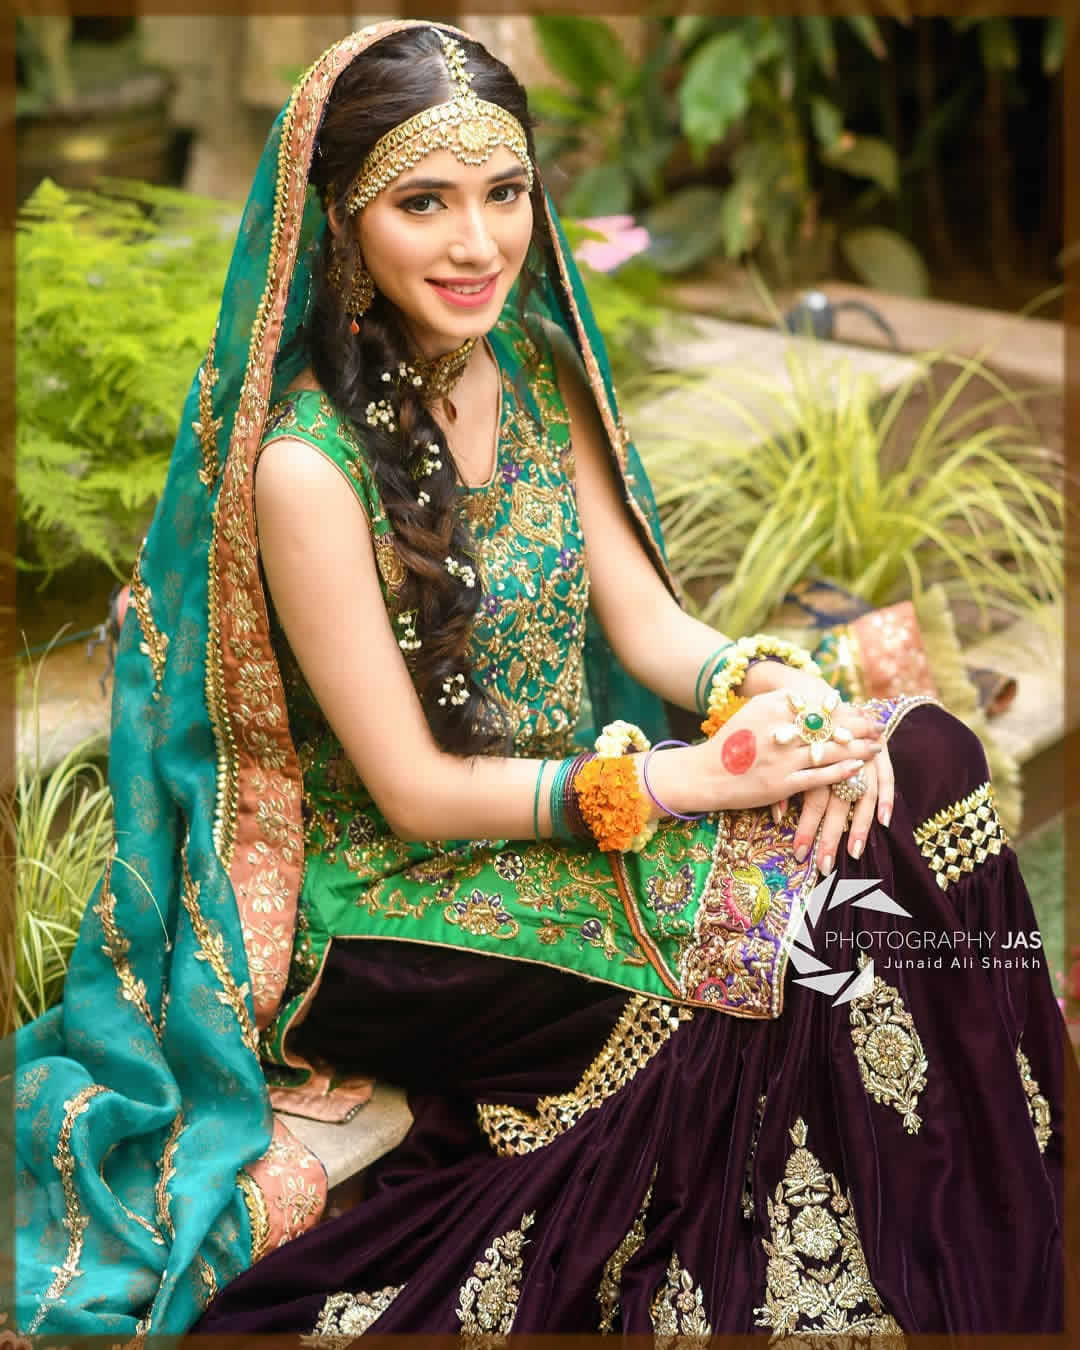 sharara dress for mehndi bride